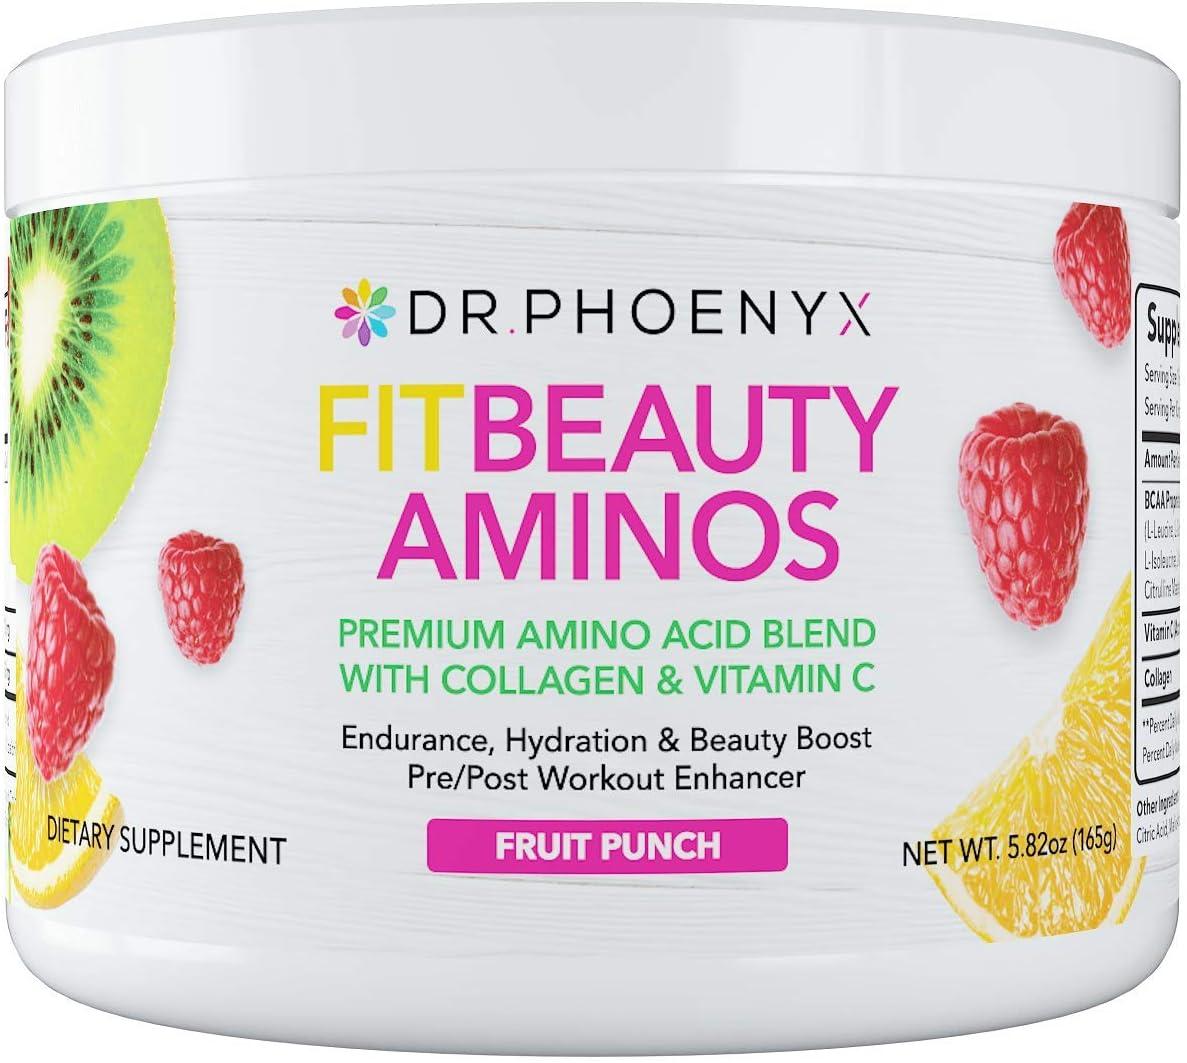 Dr. Phoenyx FitBeauty Amino Acid Blend